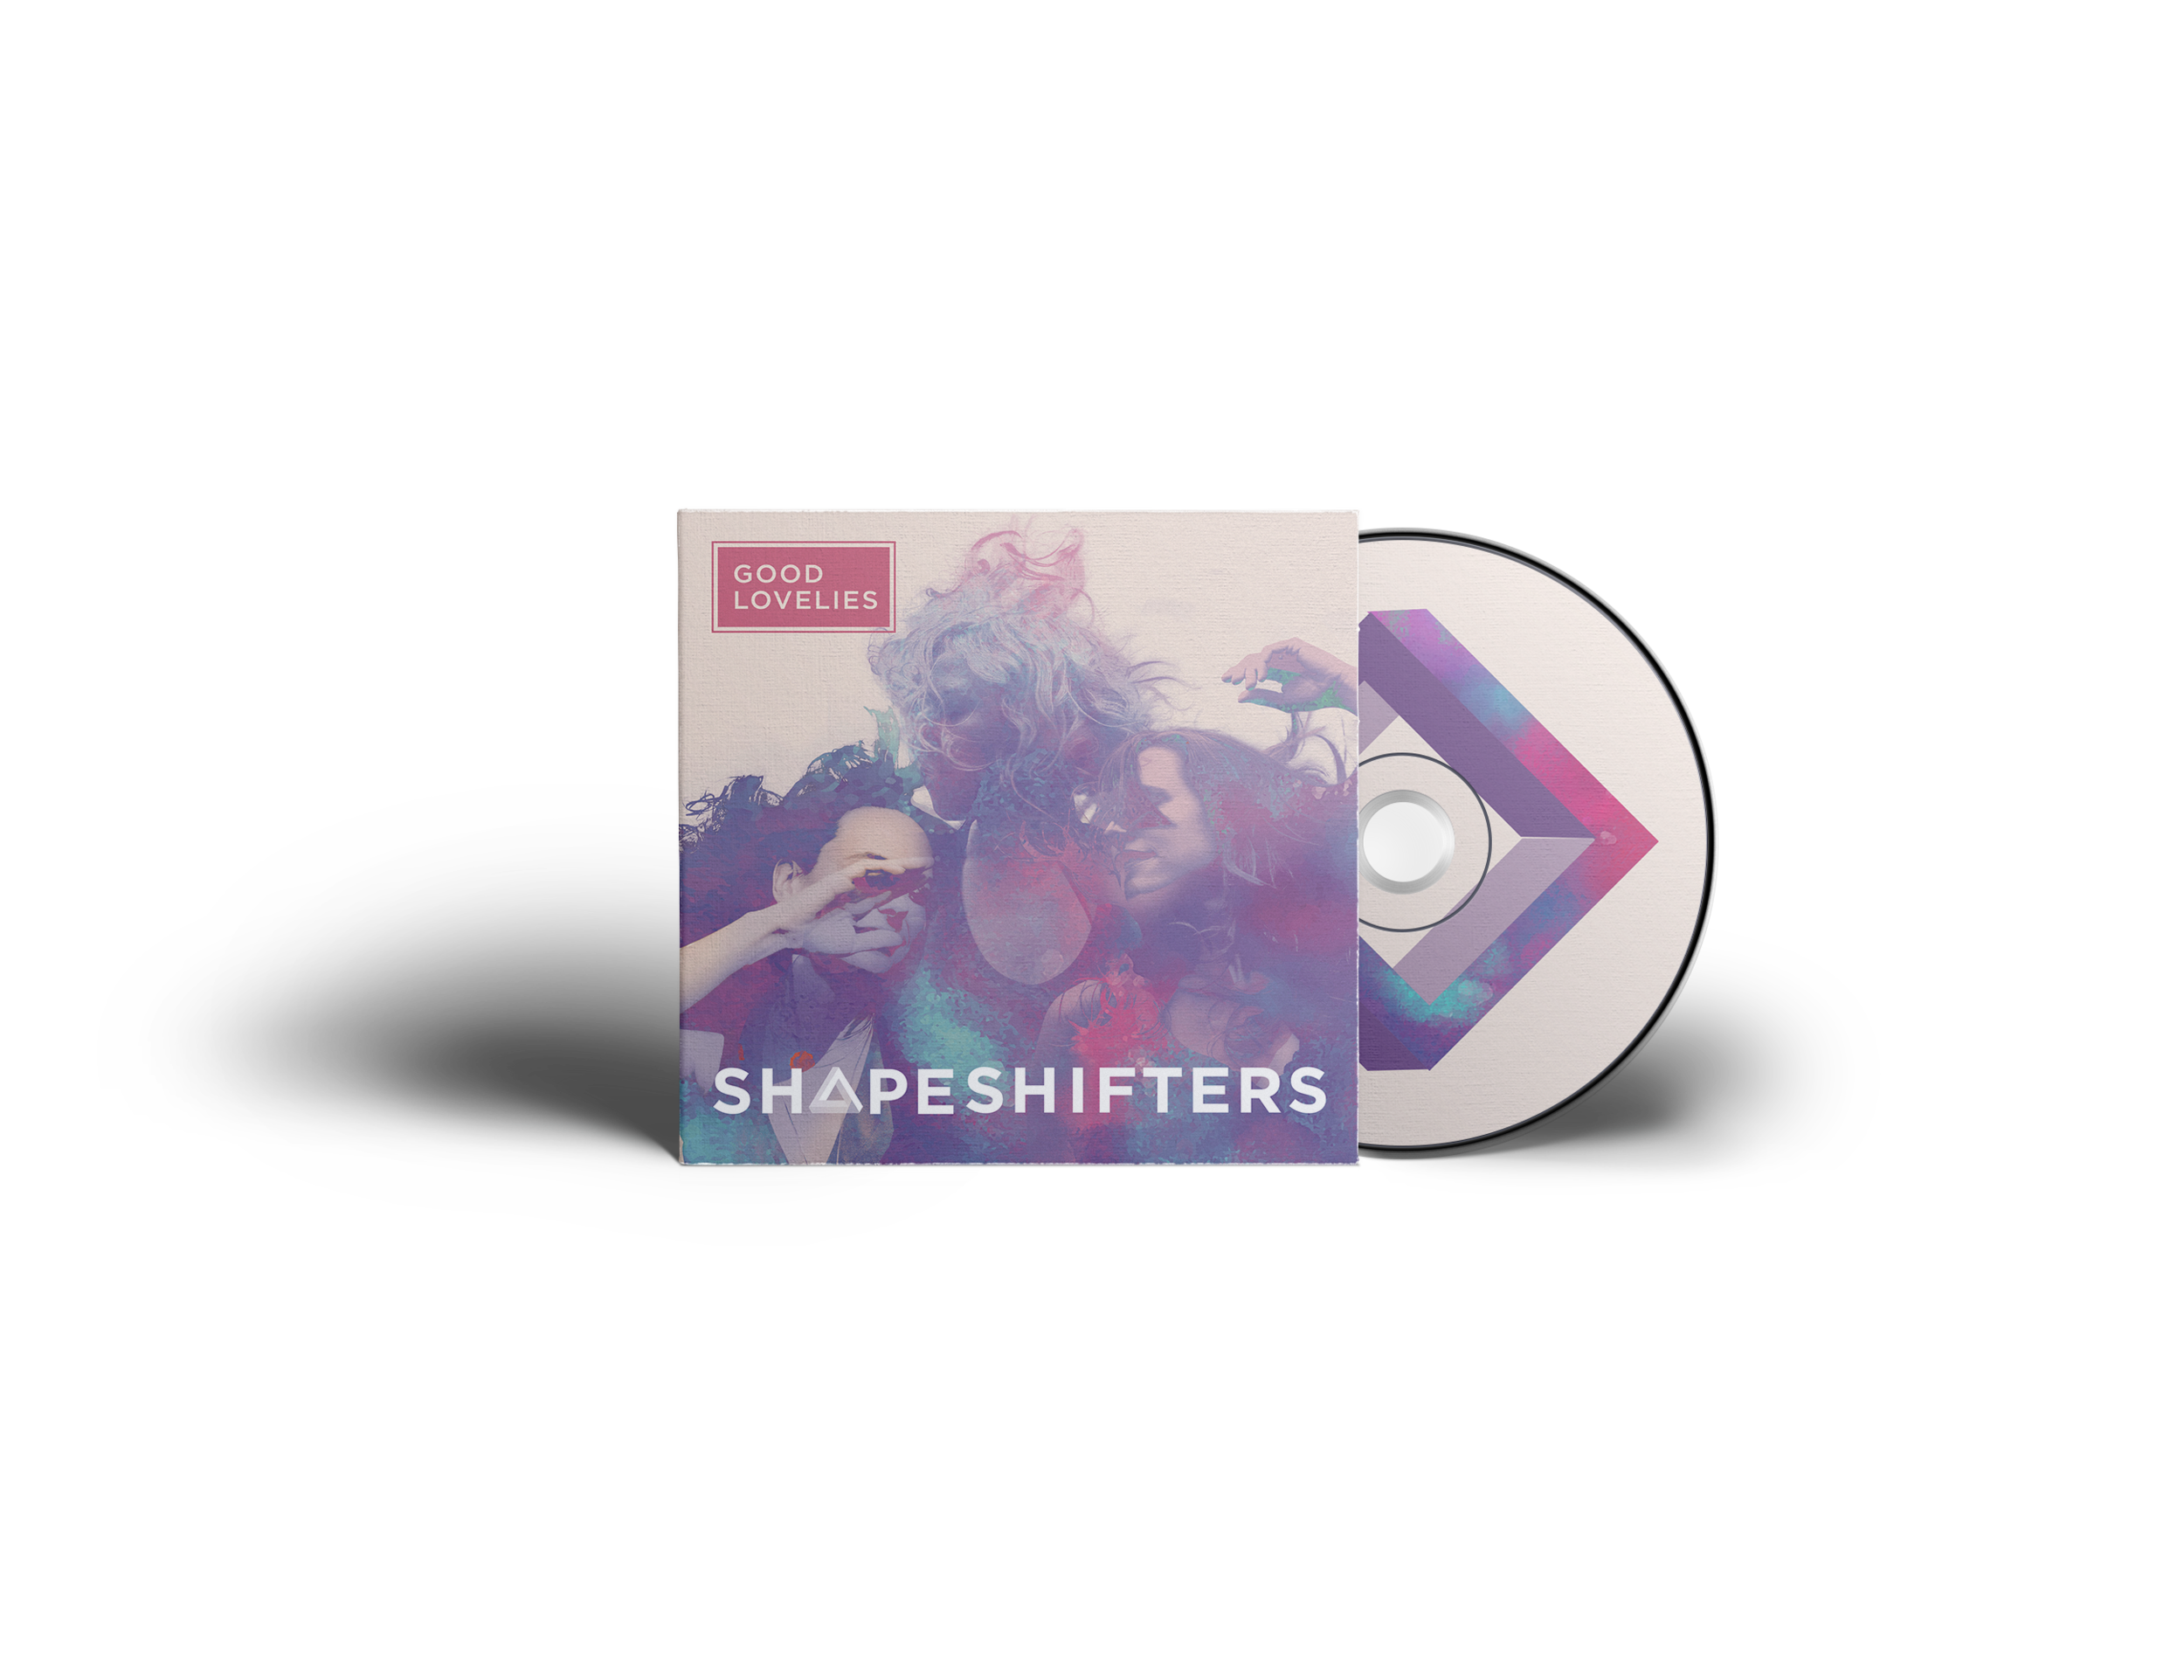 Shapeshifters – Good Lovelies